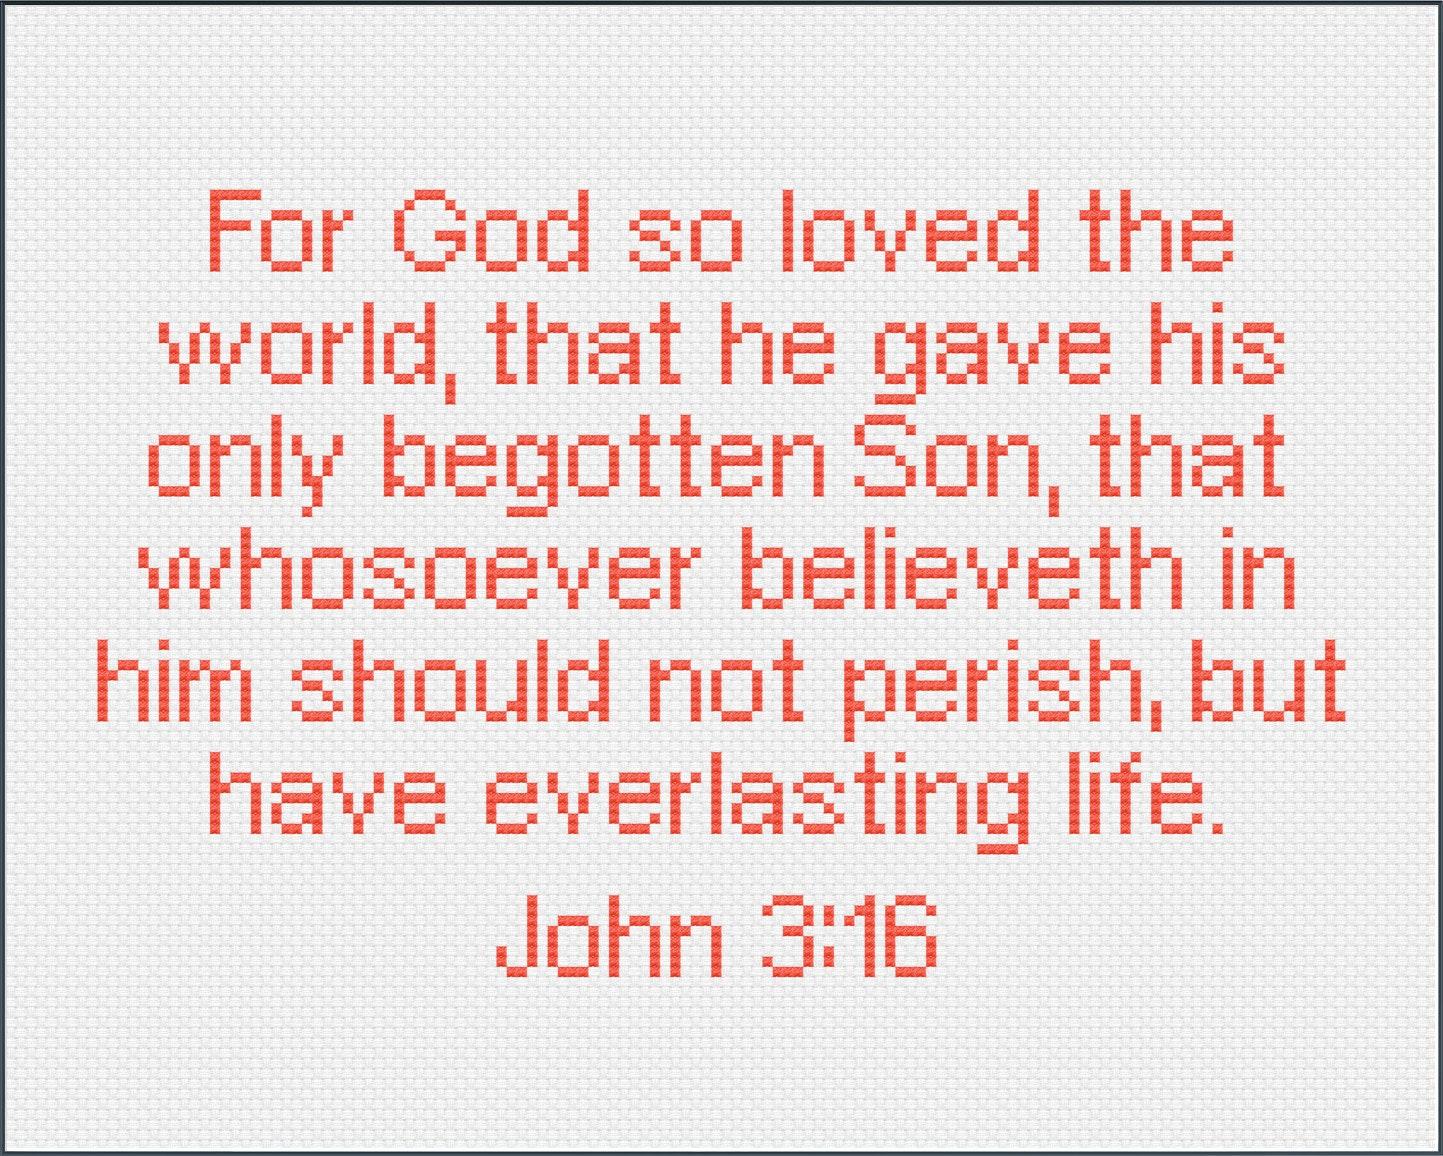 John 3:16 Bible Verse Cross Stitch Pattern For God so | Etsy